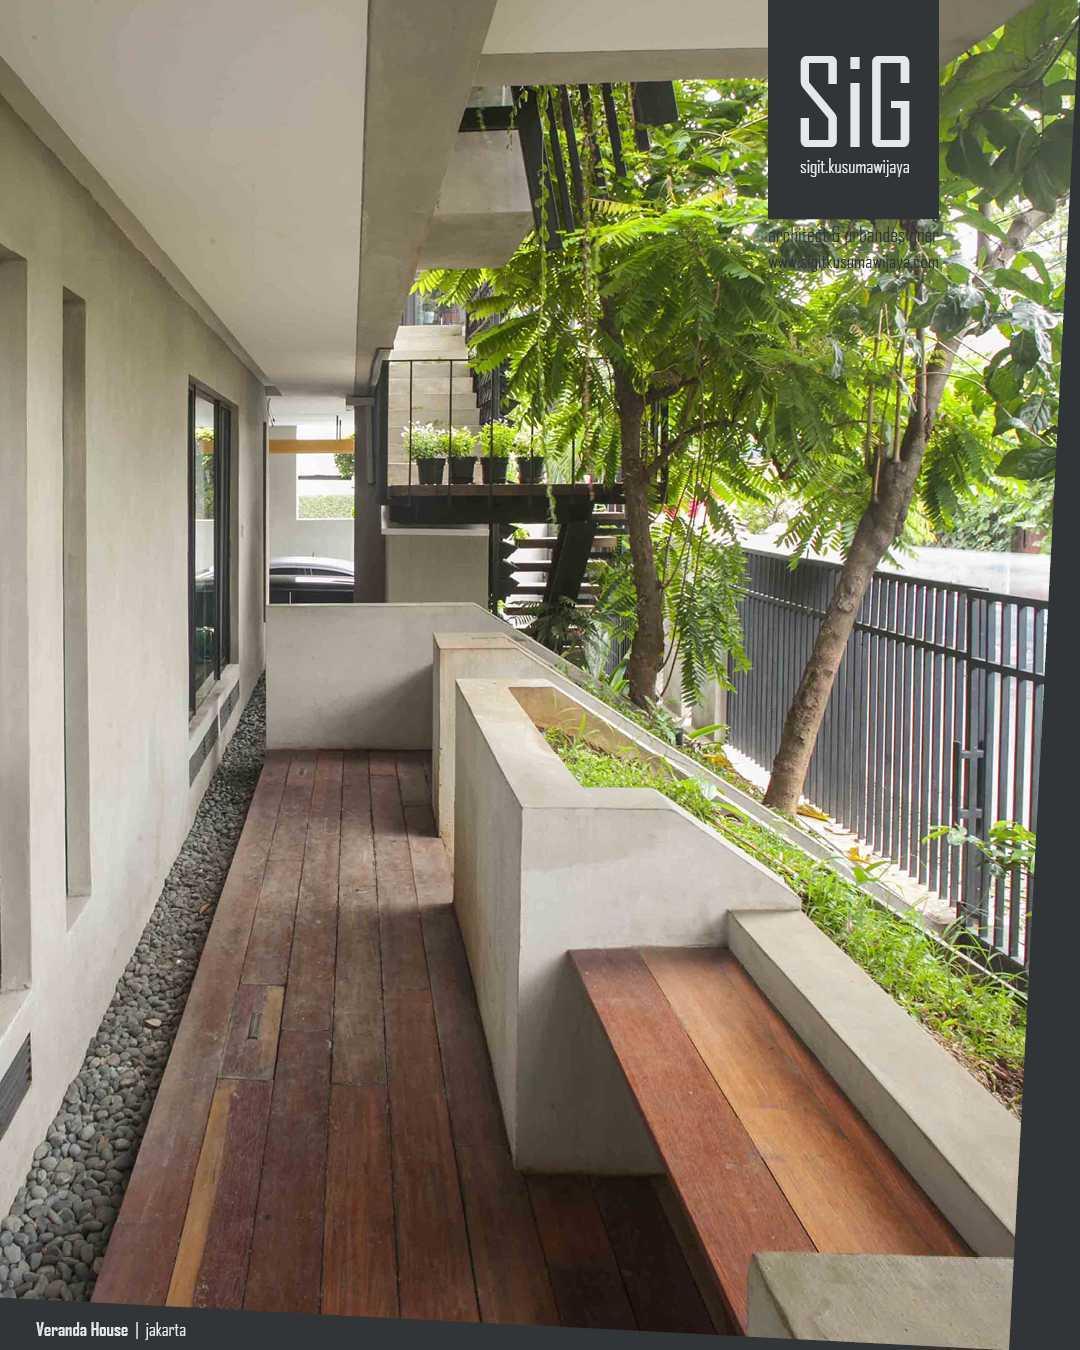 Sigit.kusumawijaya | Architect & Urbandesigner Rumah Beranda - Green Boarding House Cipete, South Jakarta, Indonesia Cipete, South Jakarta, Indonesia Sigitkusumawijaya-Architect-Urbandesigner-Rumah-Beranda-Green-Boarding-House Industrial 55006